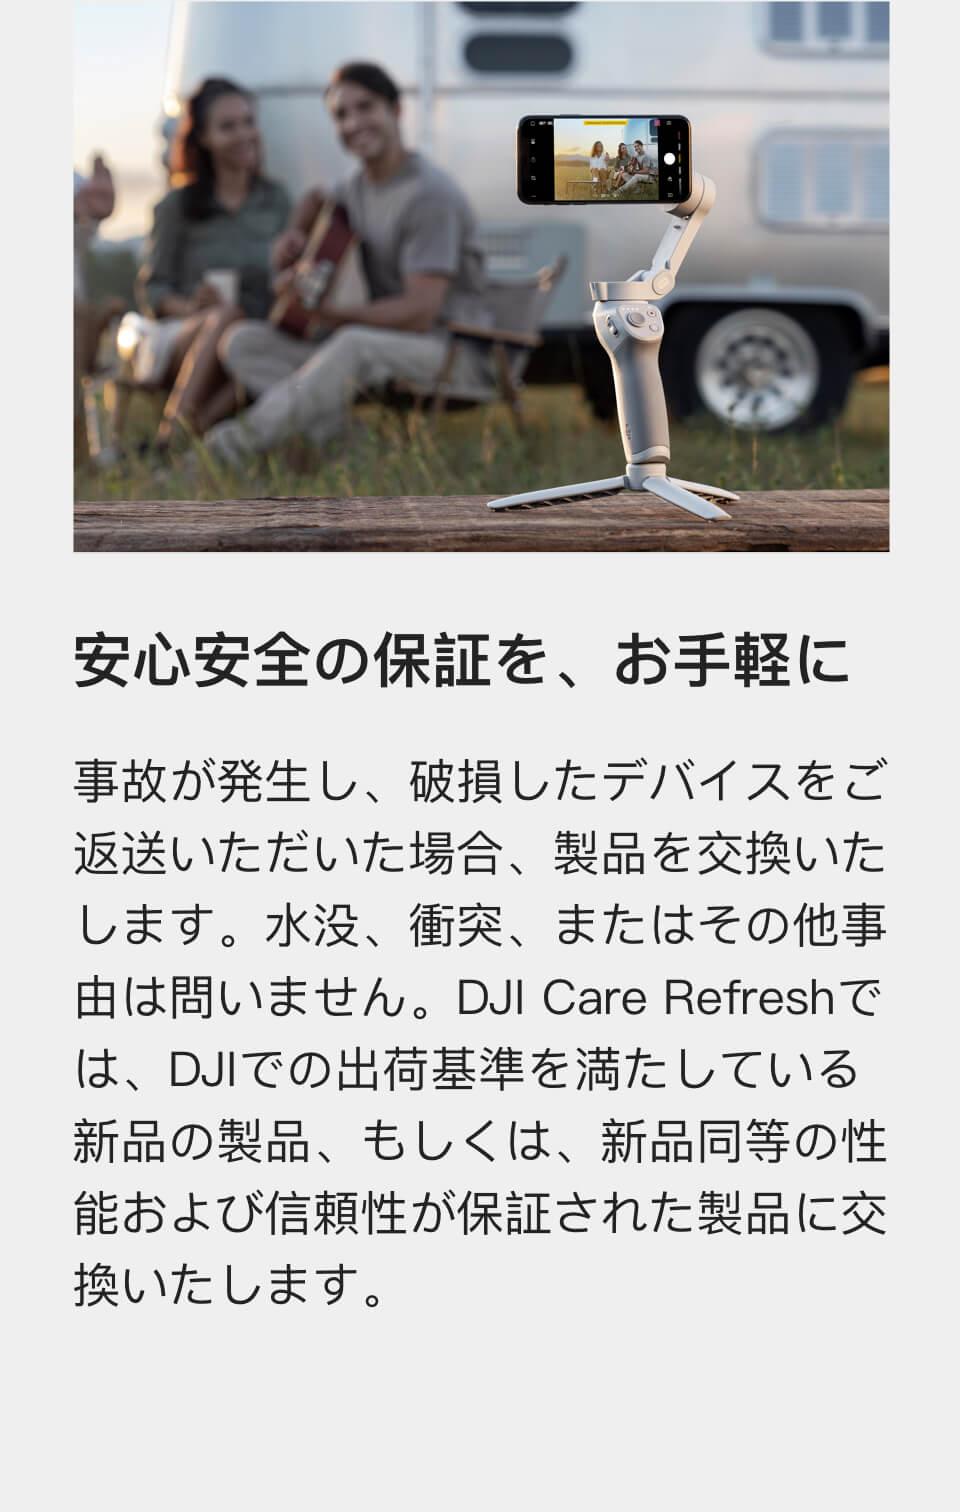 DJI Care Refresh (DJI OM 4) | 安心安全の保証を、お手軽に